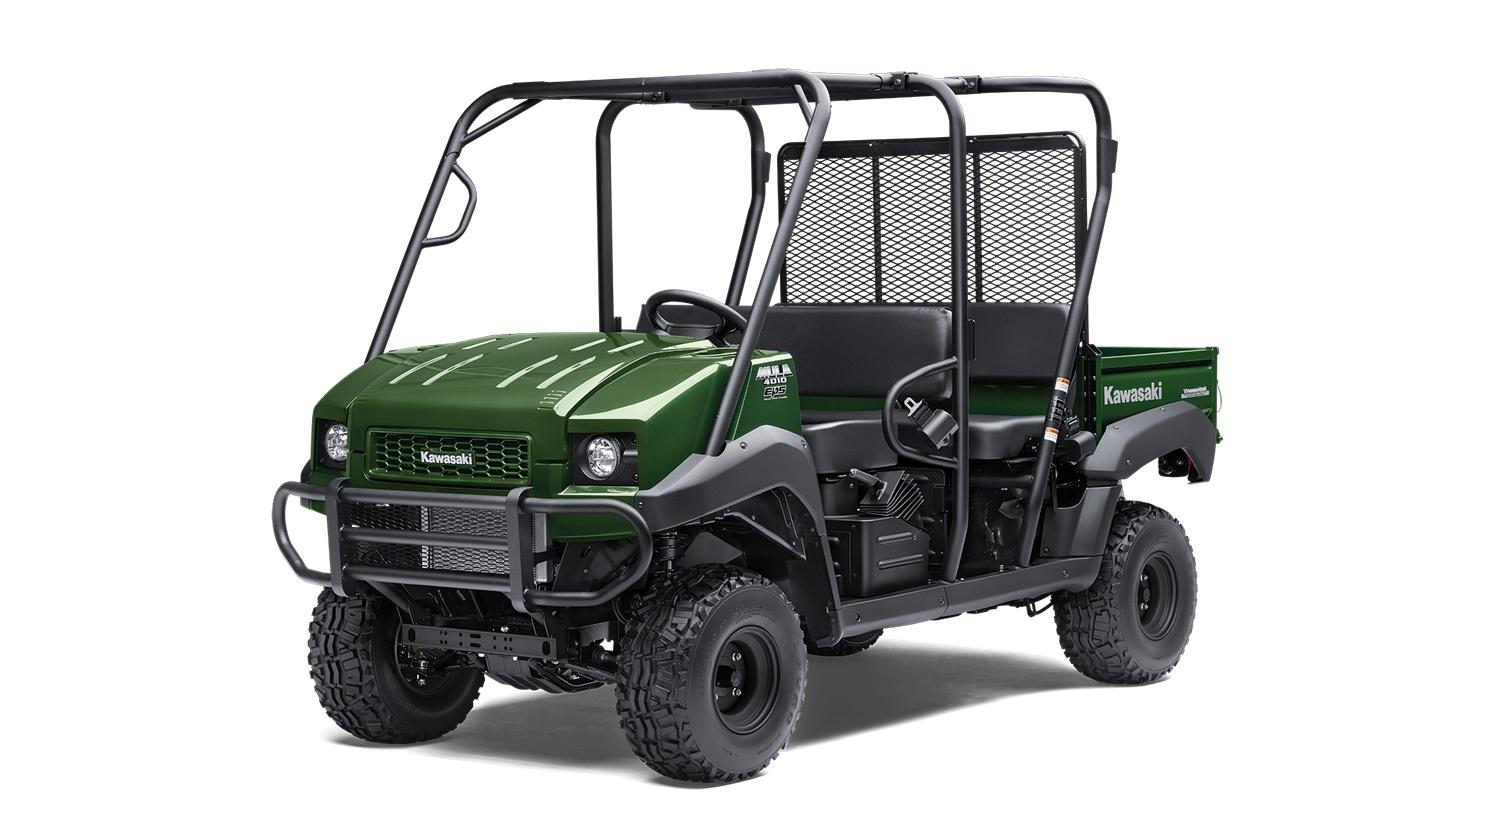 2020 Kawasaki MULE 4010 TRANS 4x4 Timberline Green